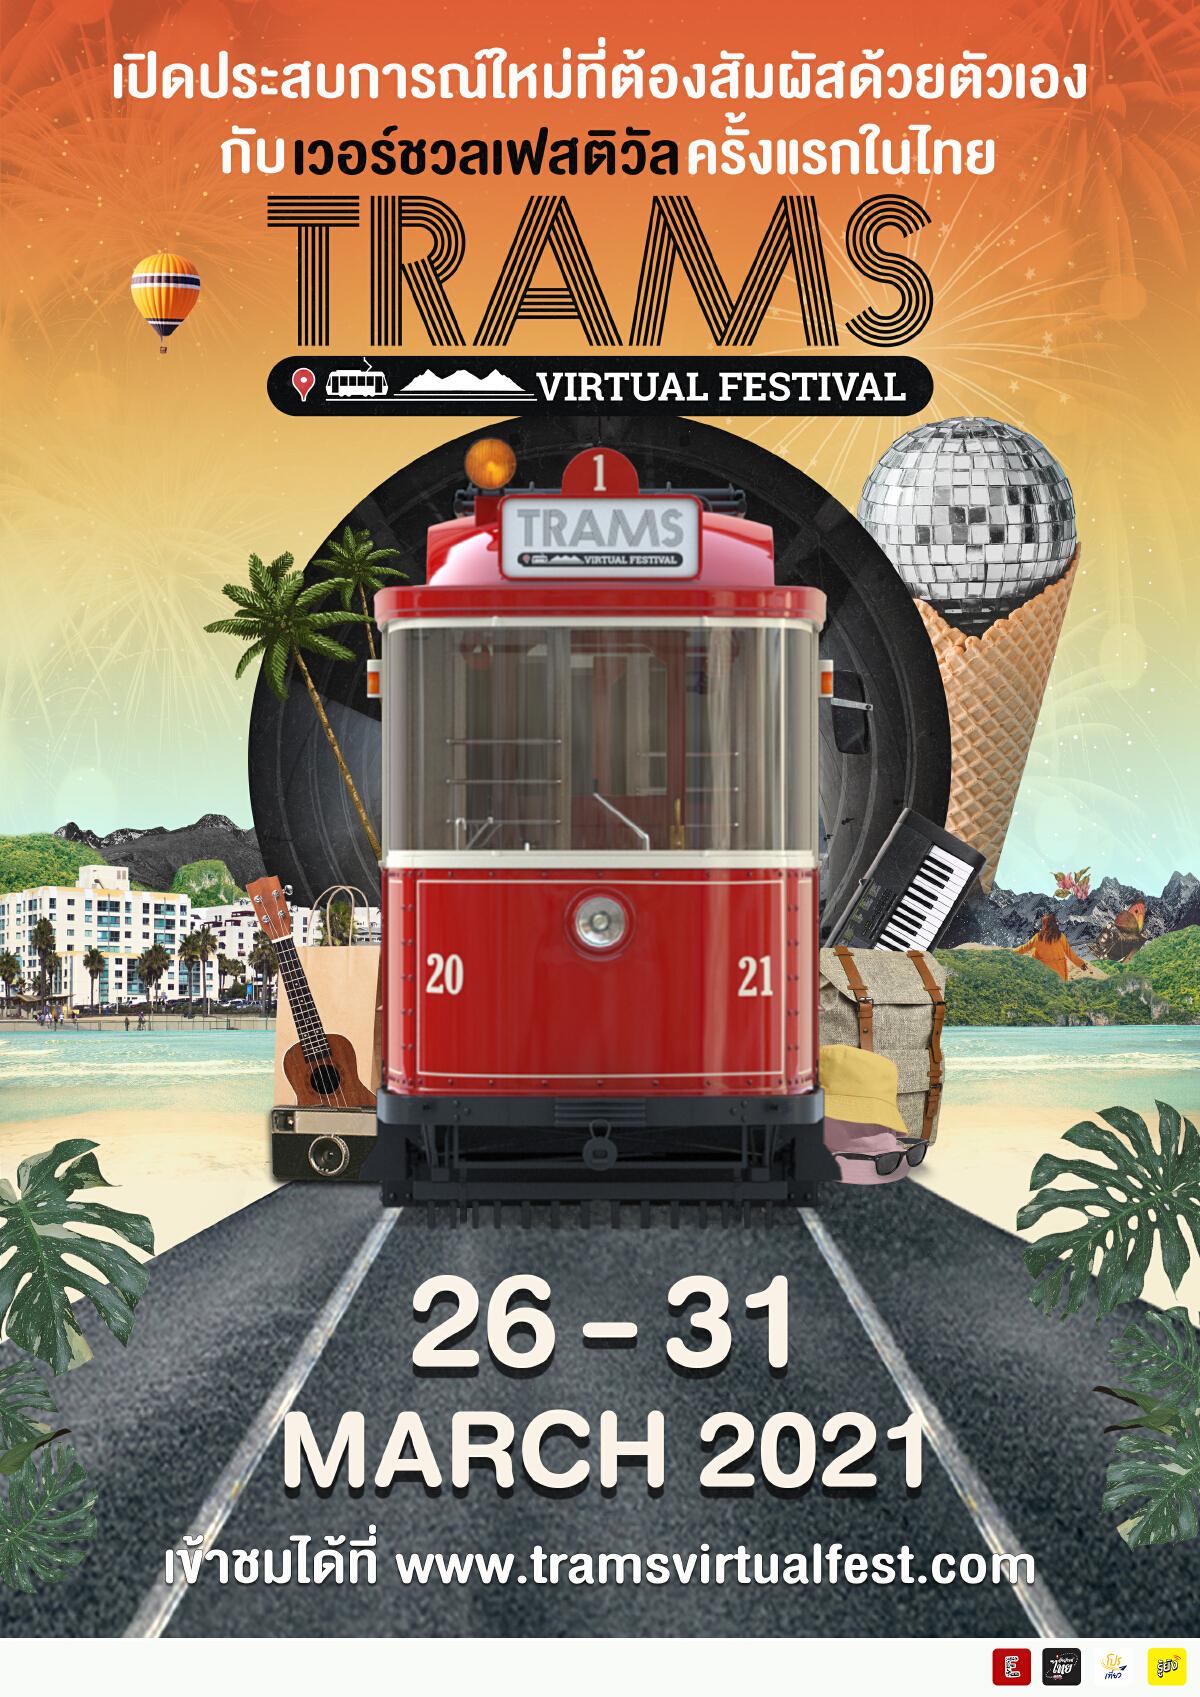 """Eventpass"" ชวนคุณมาสนุก ""TRAMS Virtual Festival"" ในรูปแบบออนไลน์"